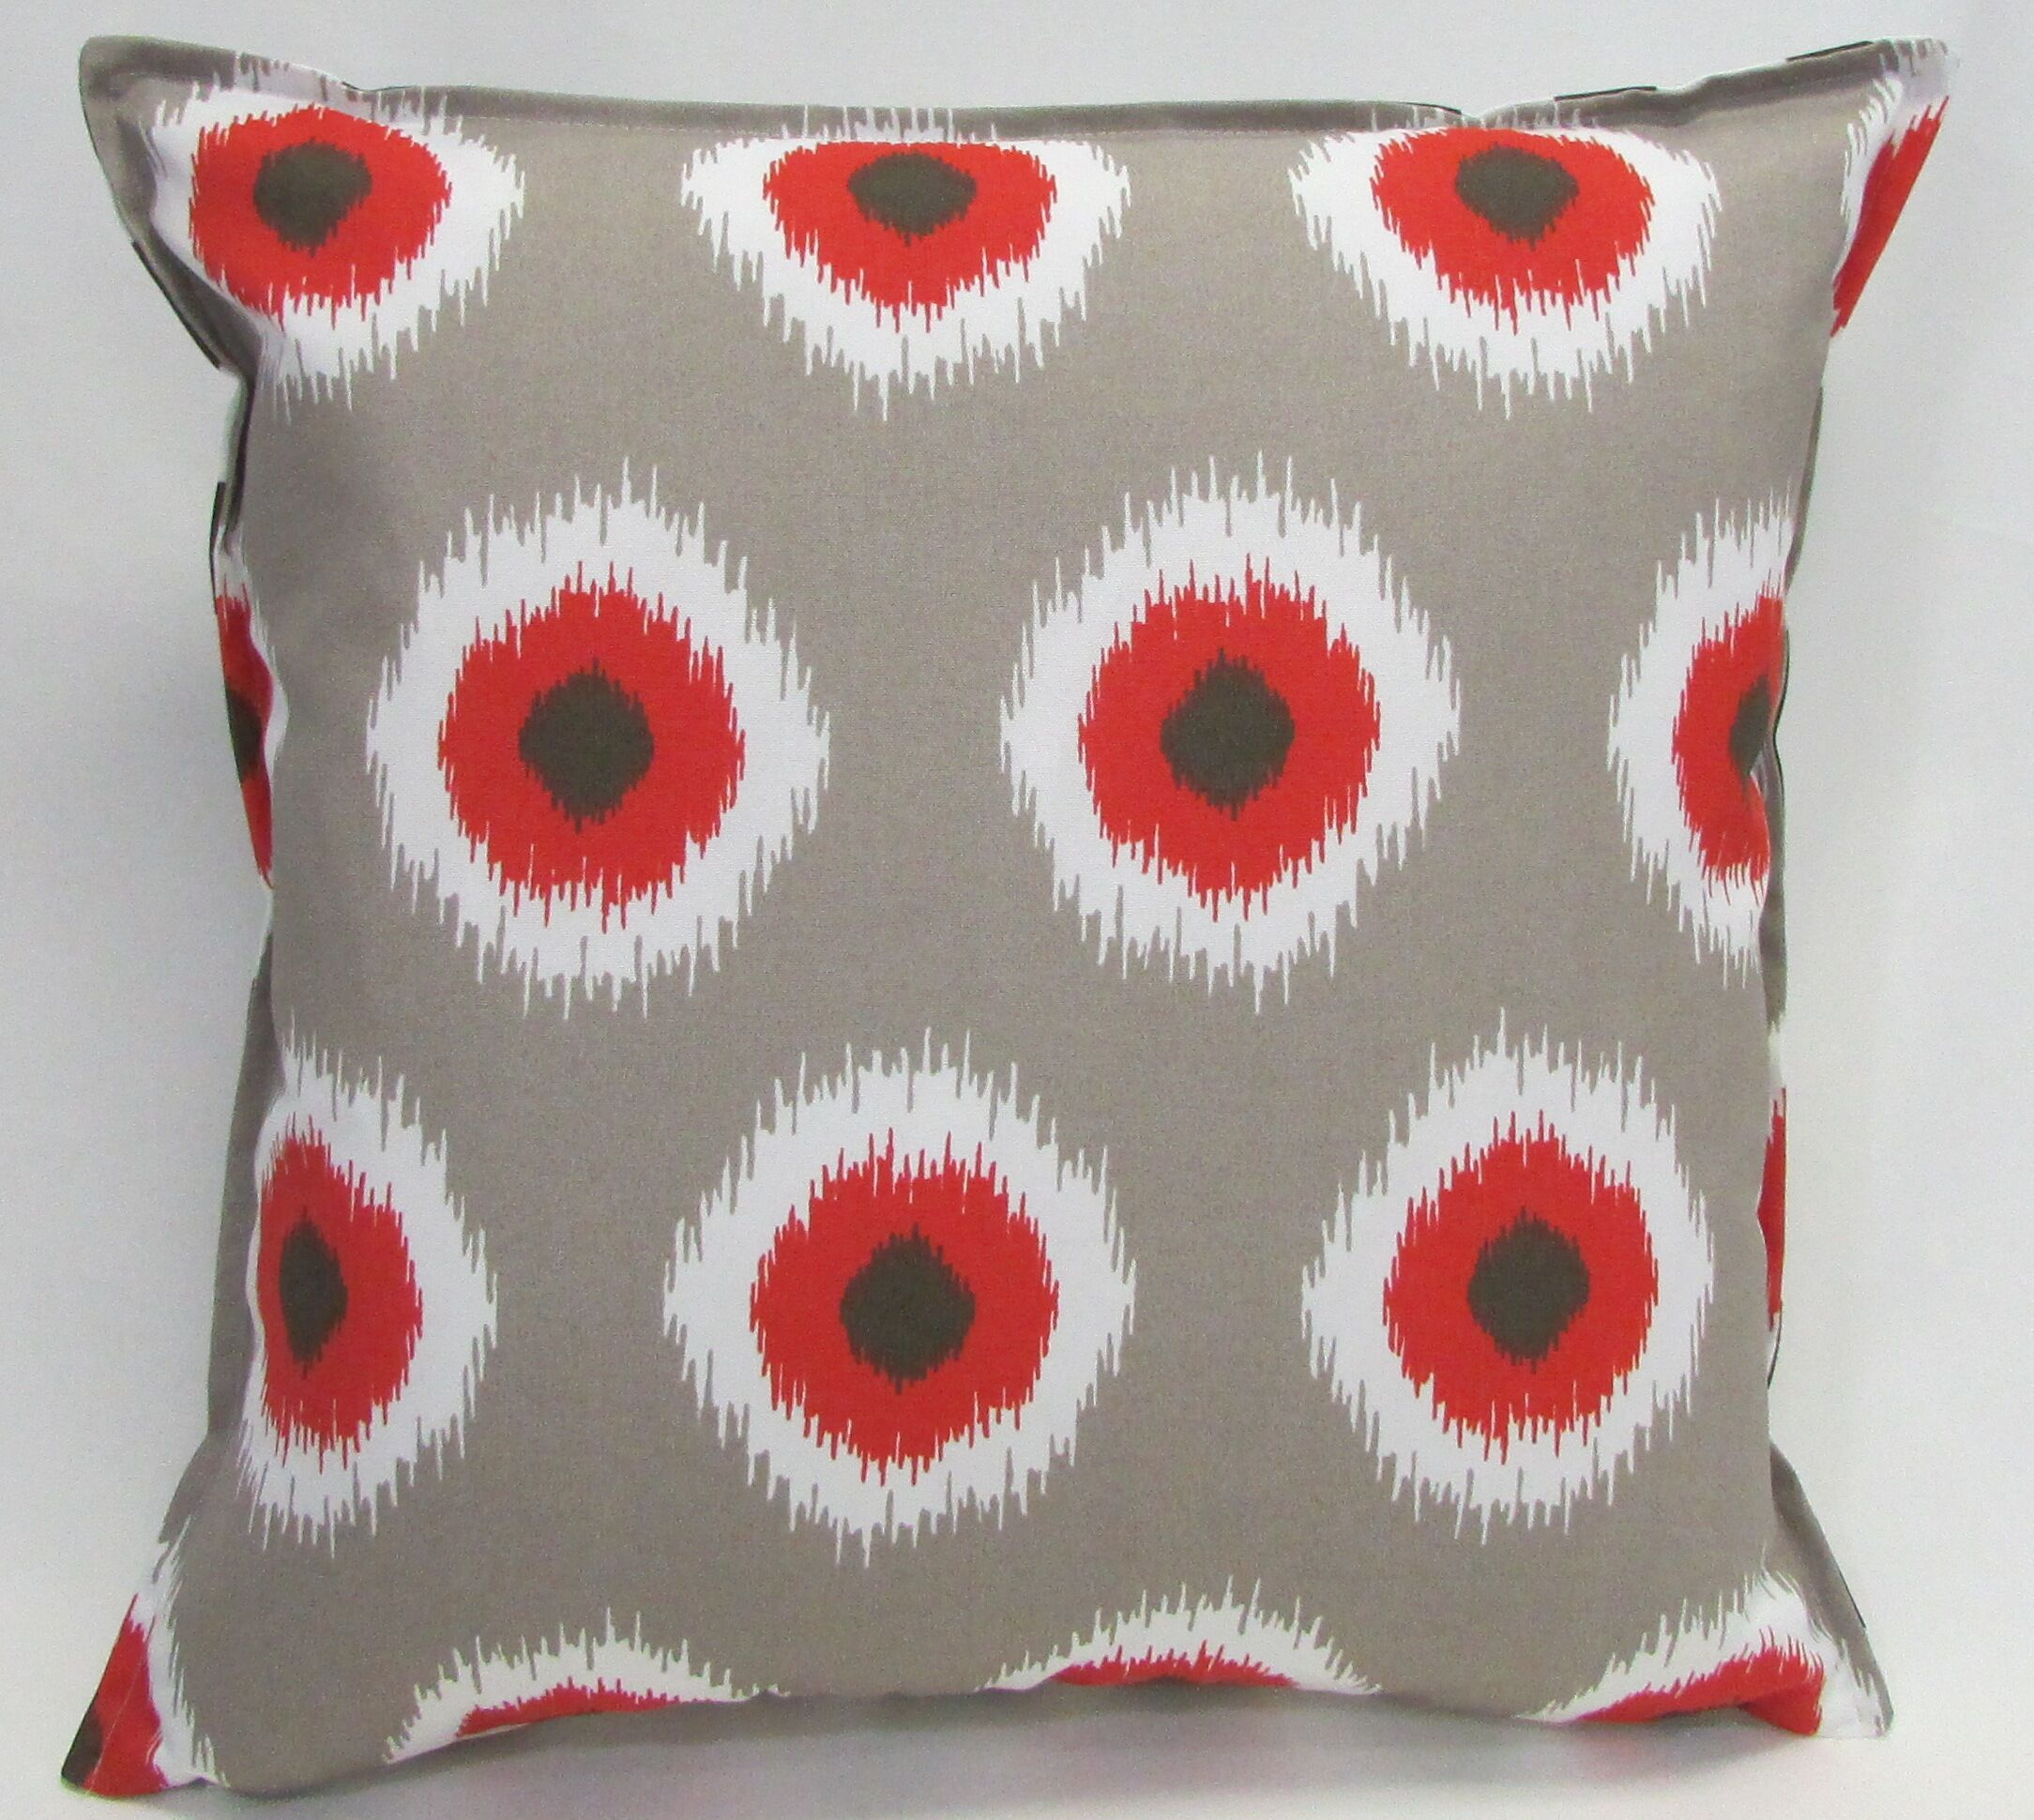 Outdoor Living Throw Pillow (Set of 2) Size: 22